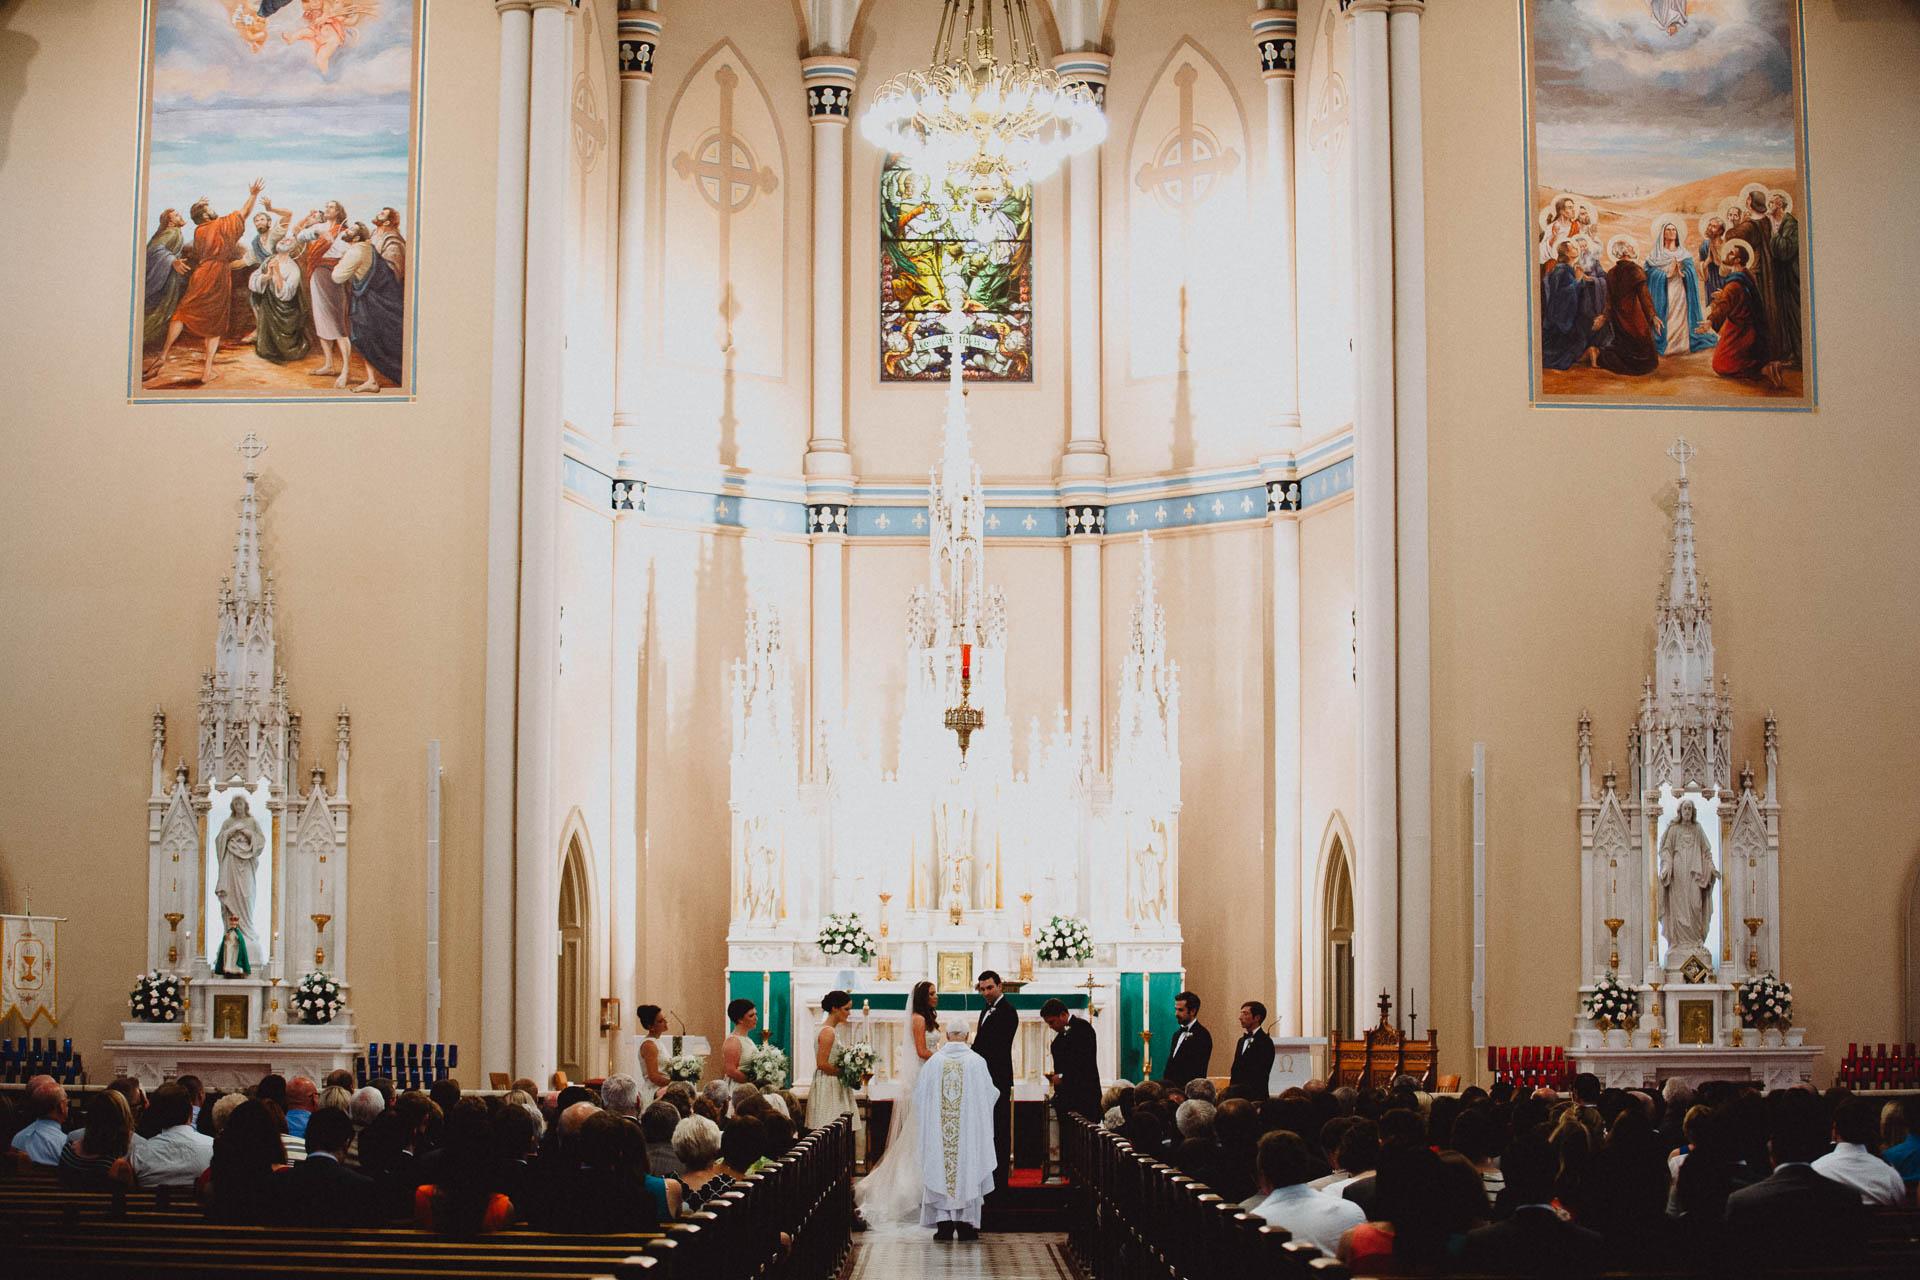 Keri-Joseph-Top-of-the-Market-Wedding-075@2x.jpg